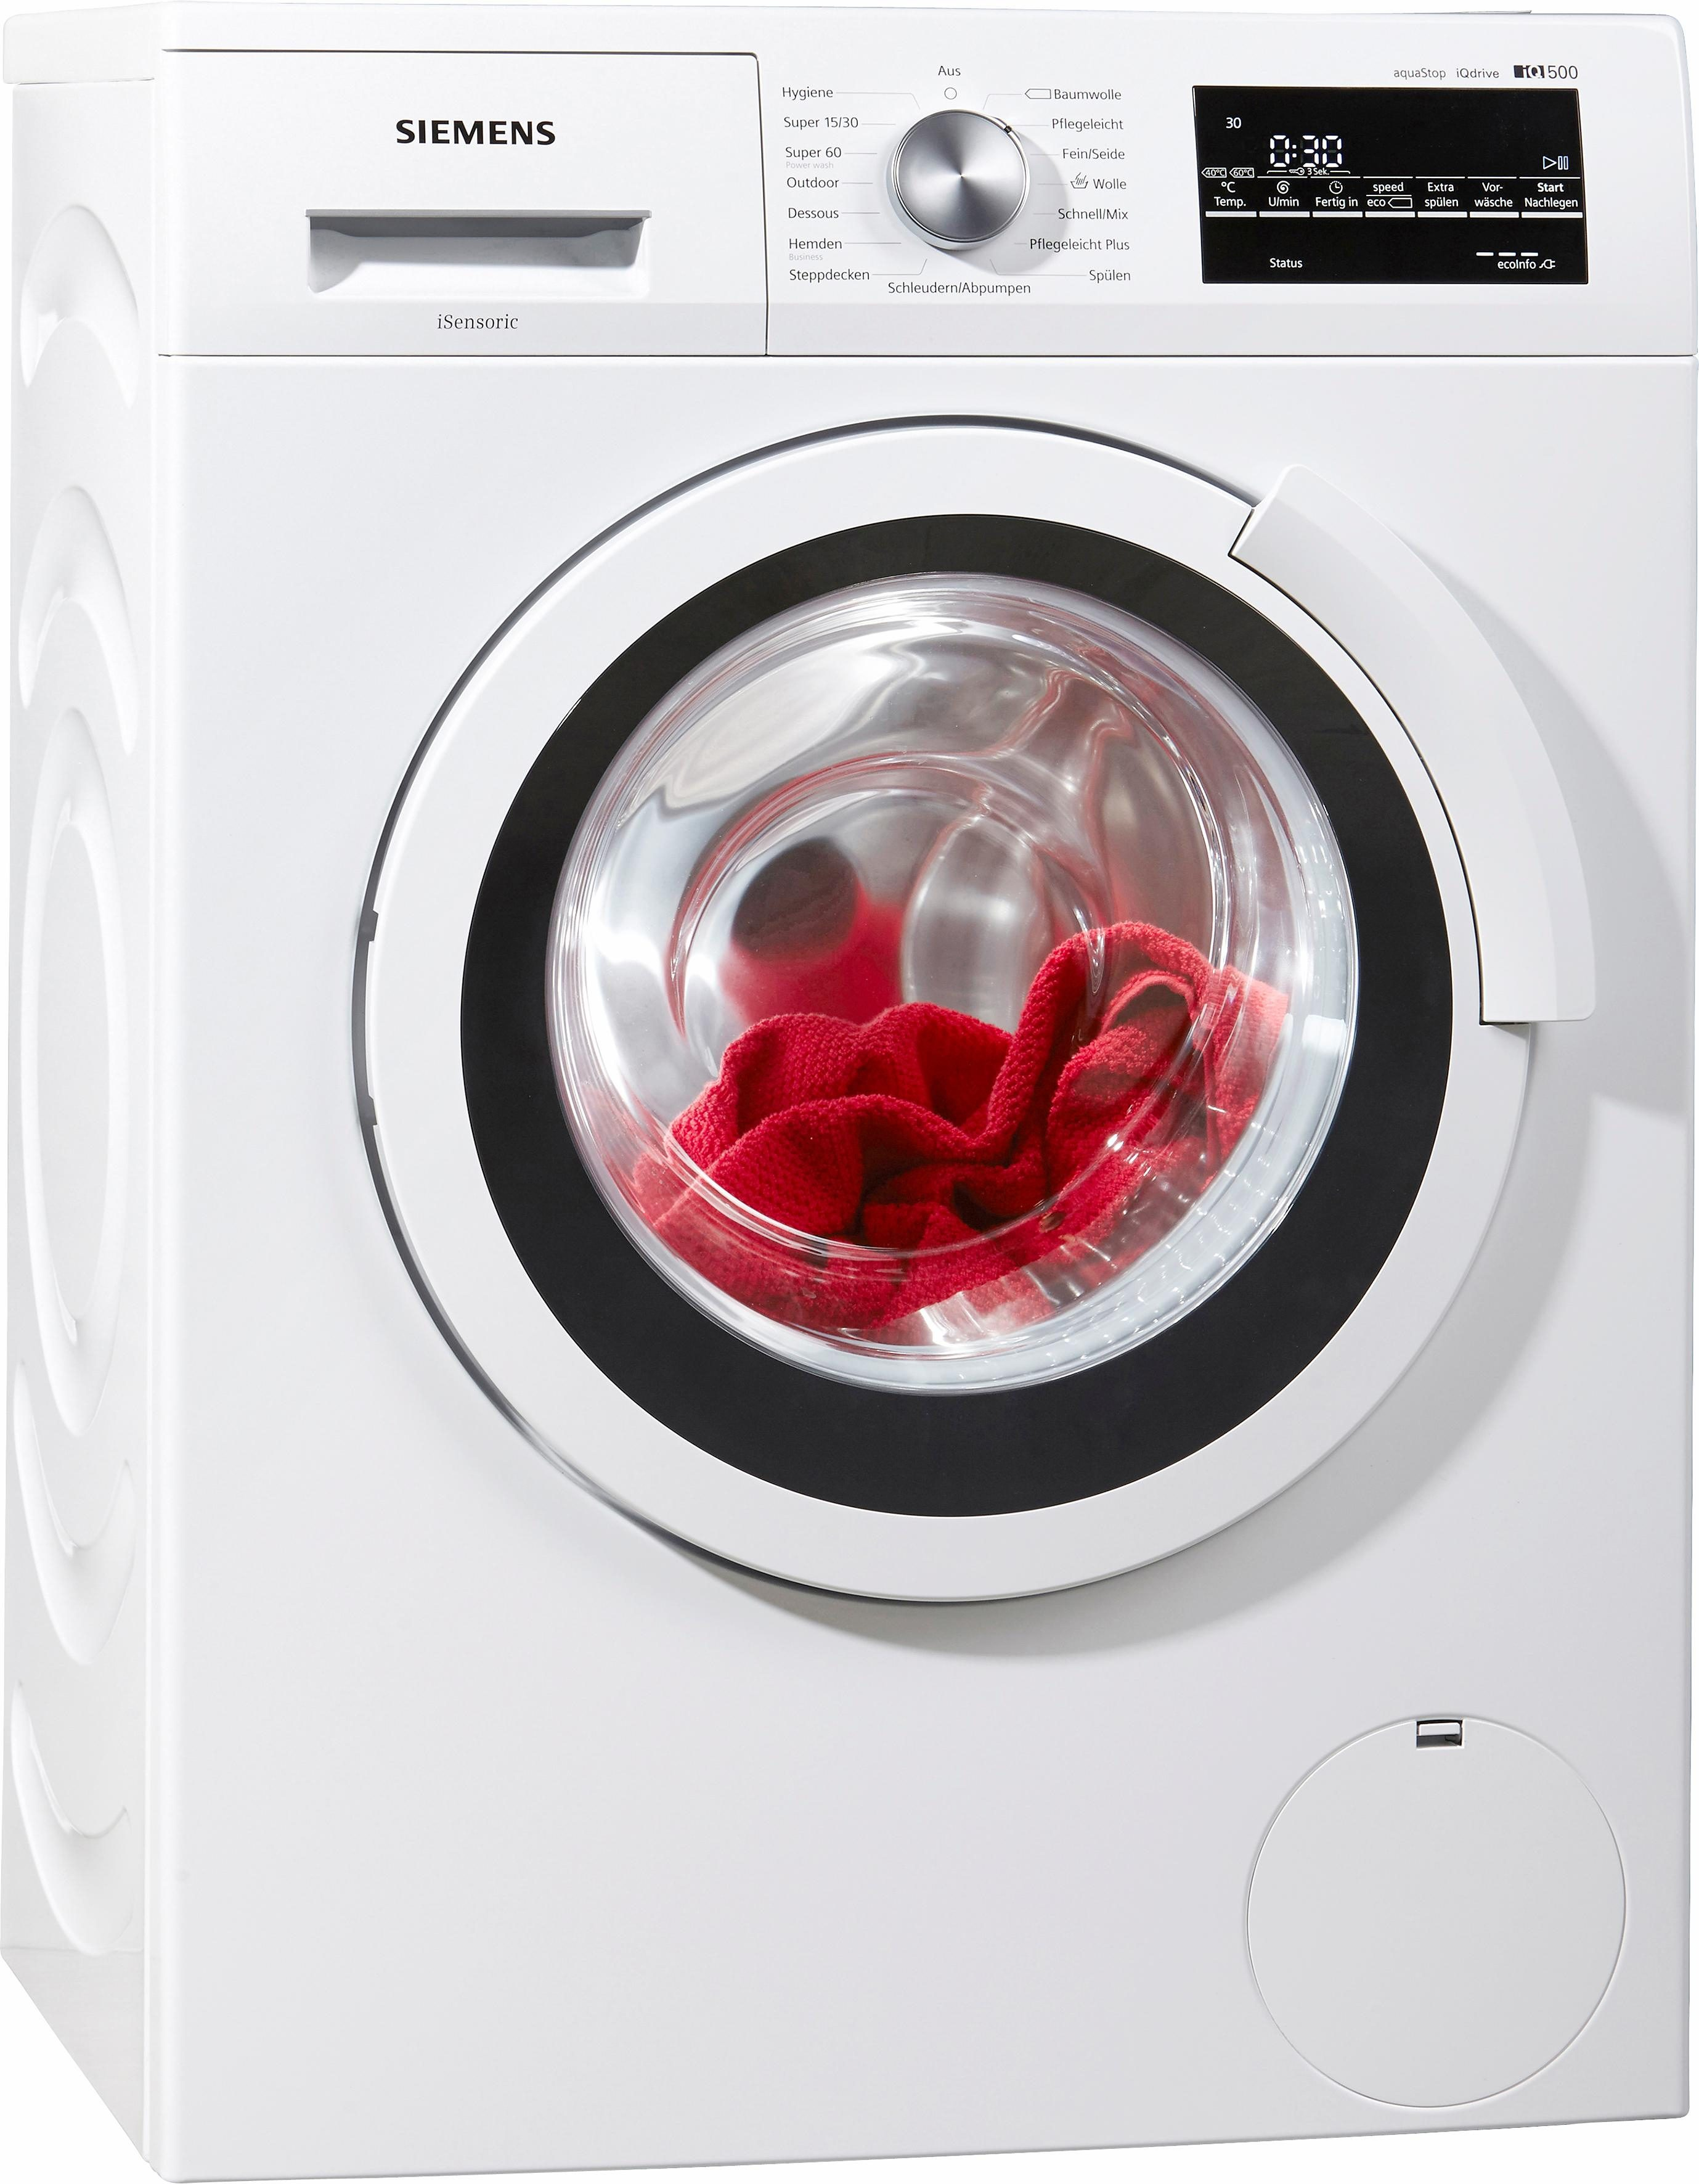 SIEMENS Waschmaschine iQ500 WS12T440, A+++, 6,5 kg, 1200 U/Min